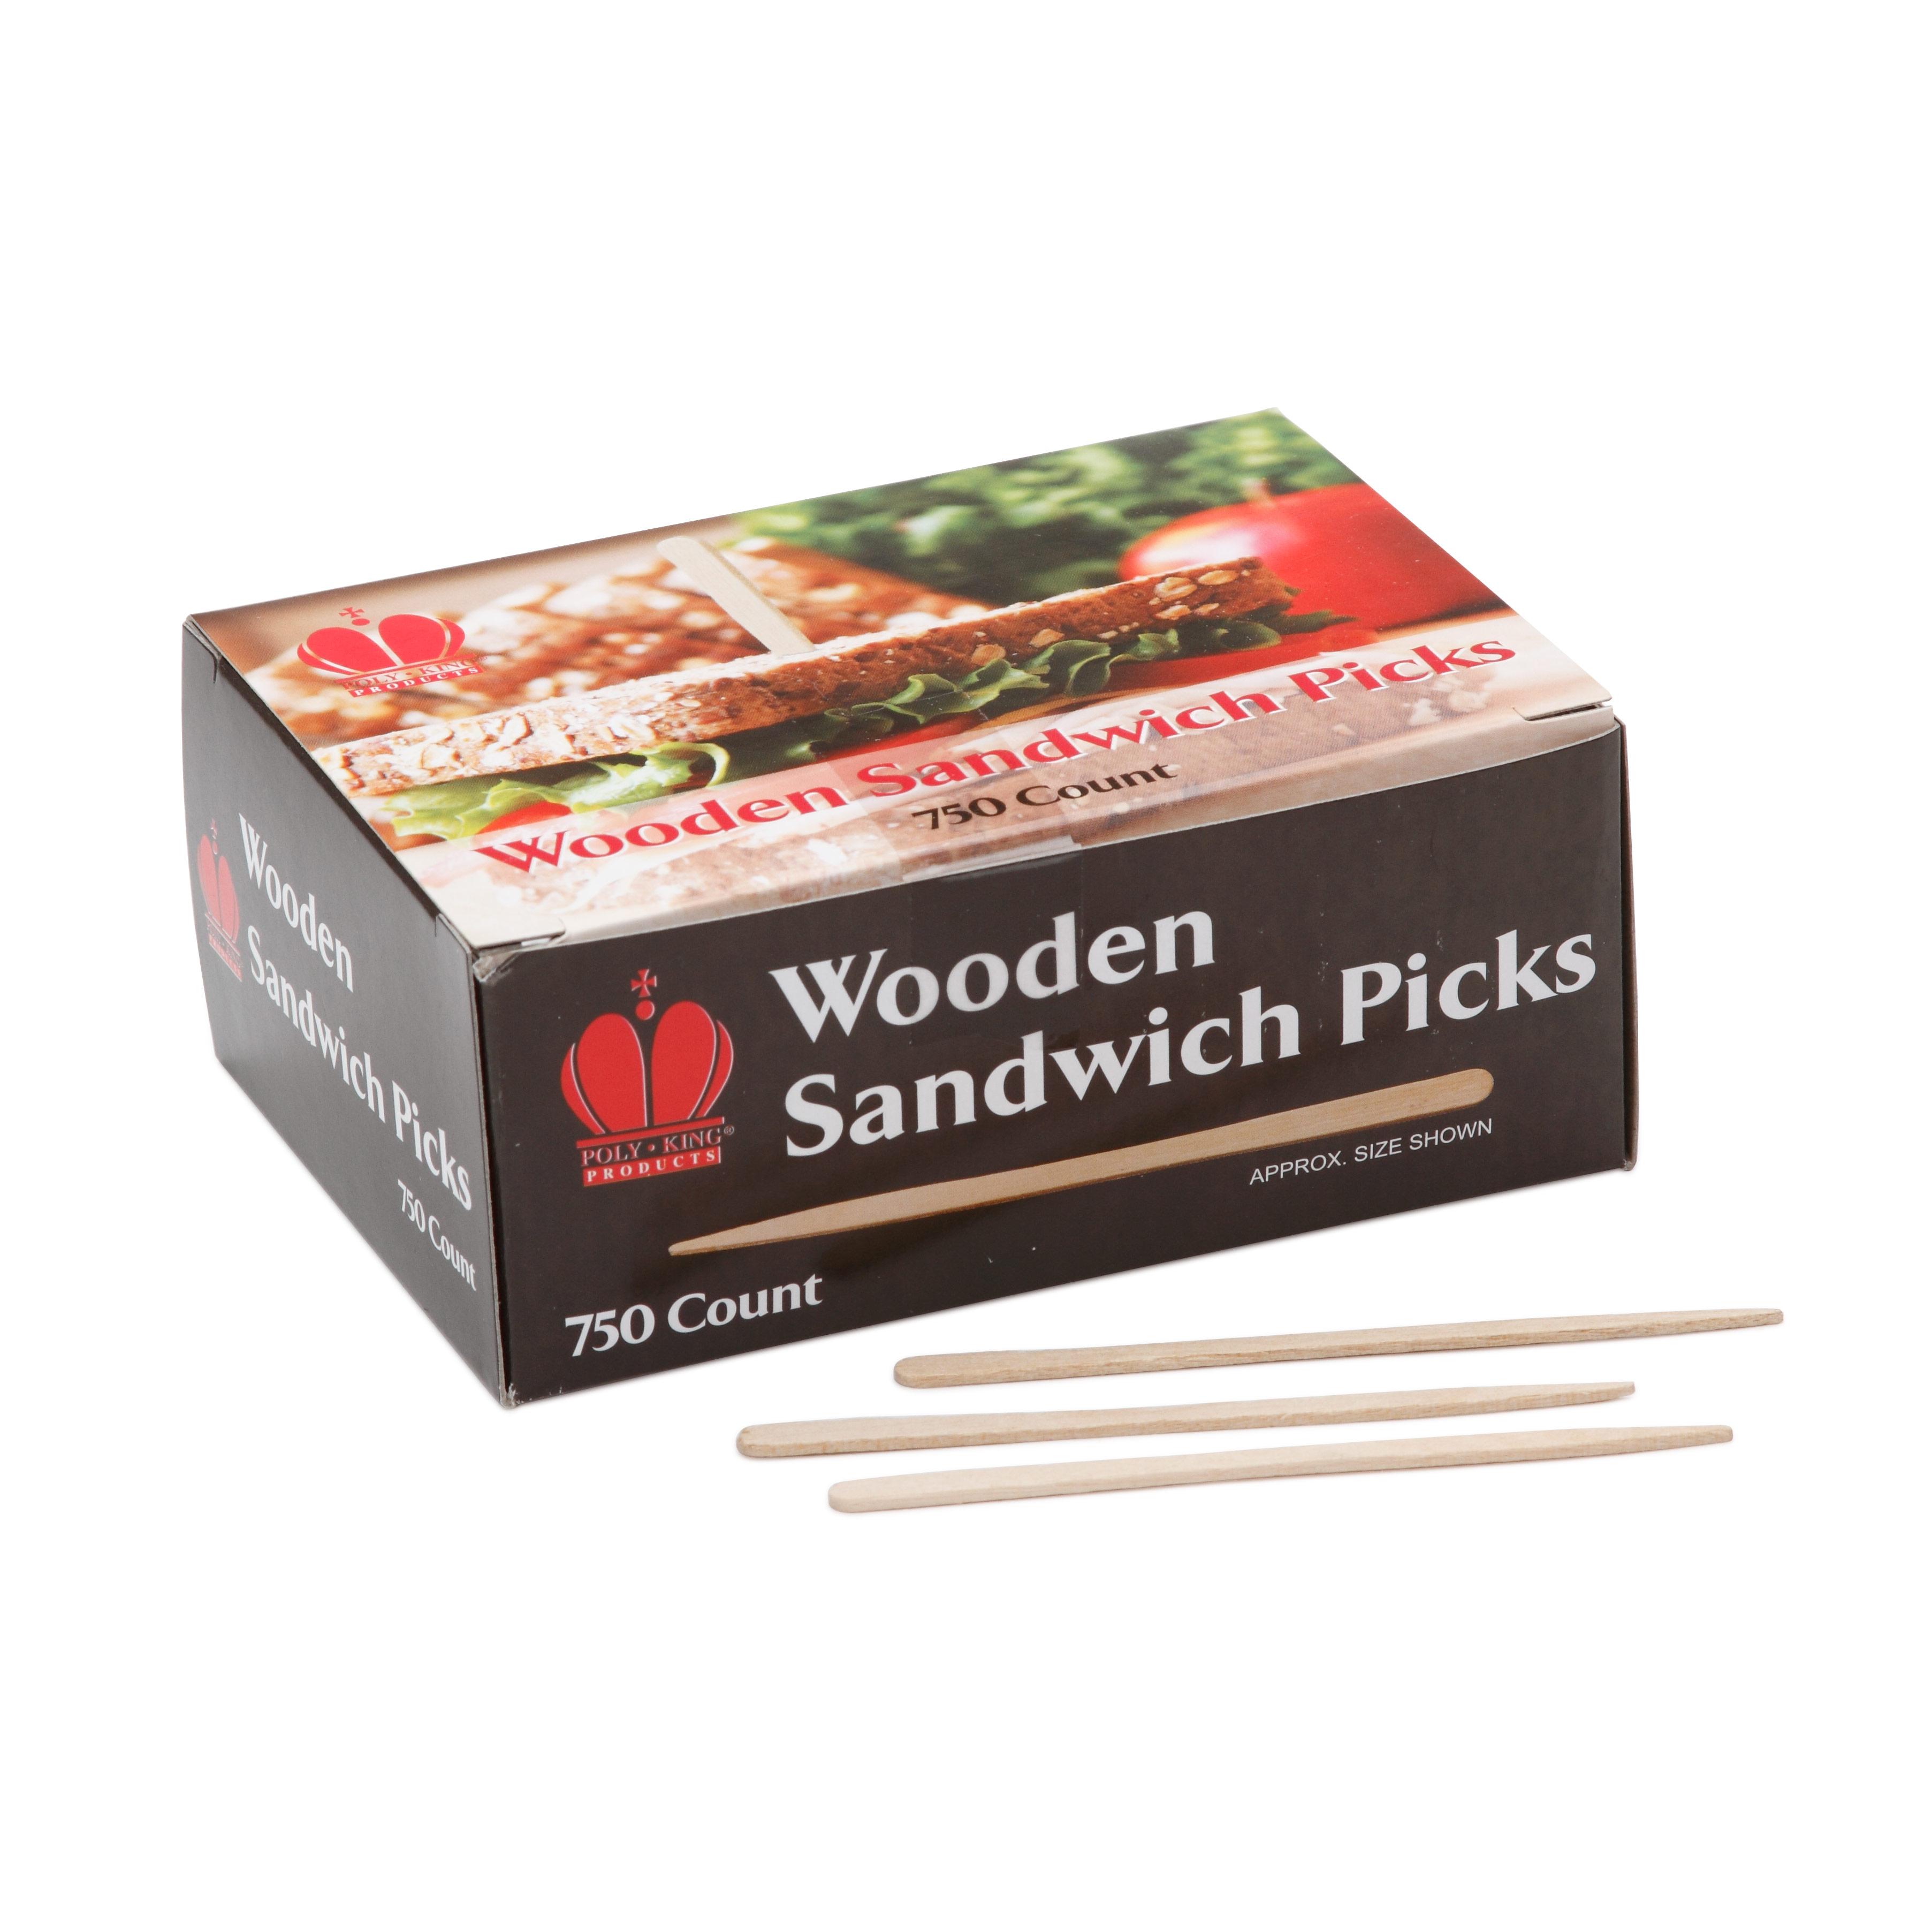 Royal Industries WD SAND PIK picks, wood